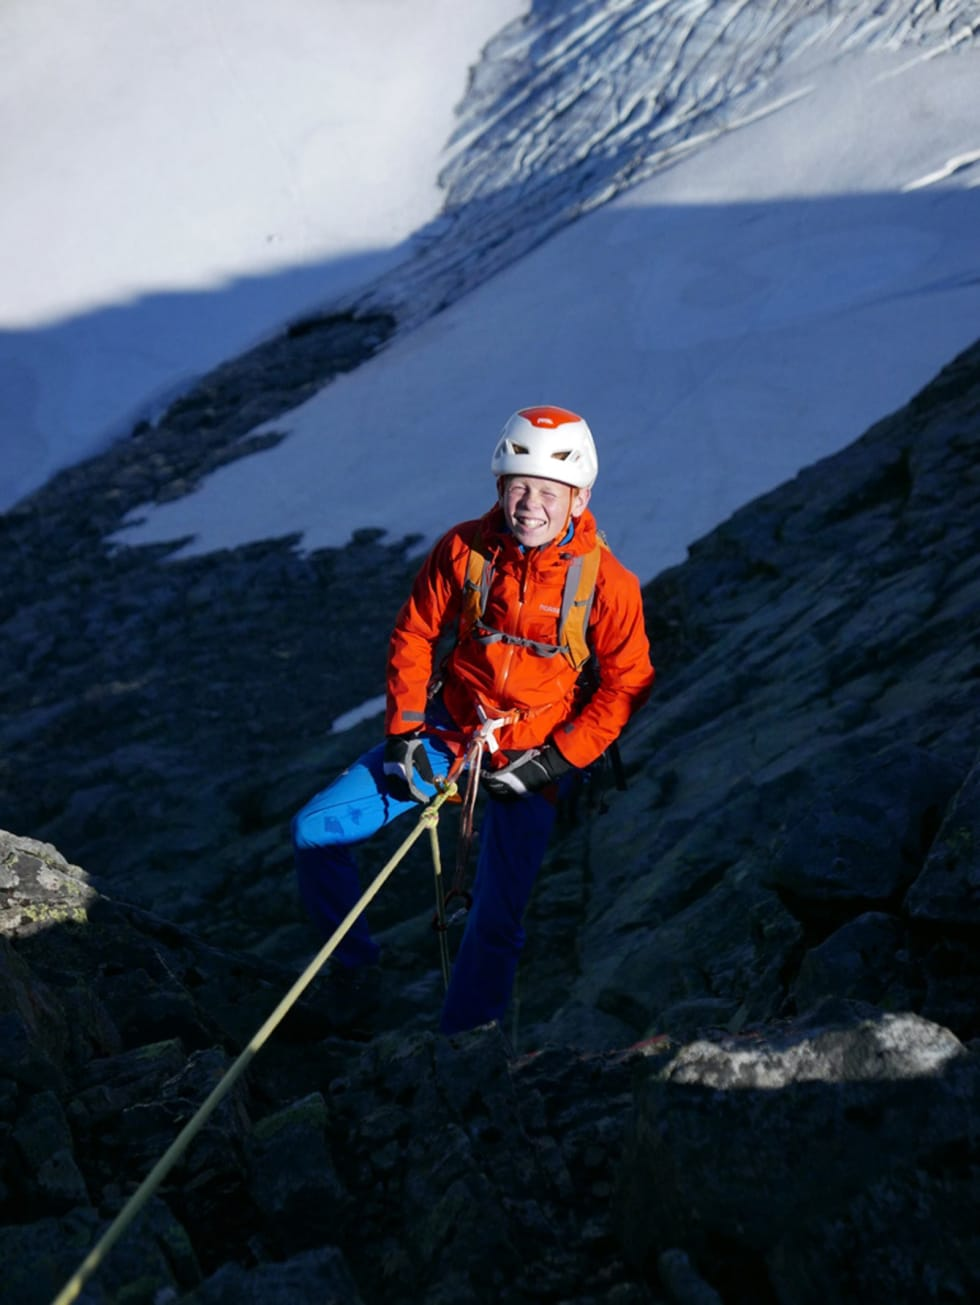 Klatreglede: En fornøyd, ung klatrer i fjellet. Foto: Robert Caspersen